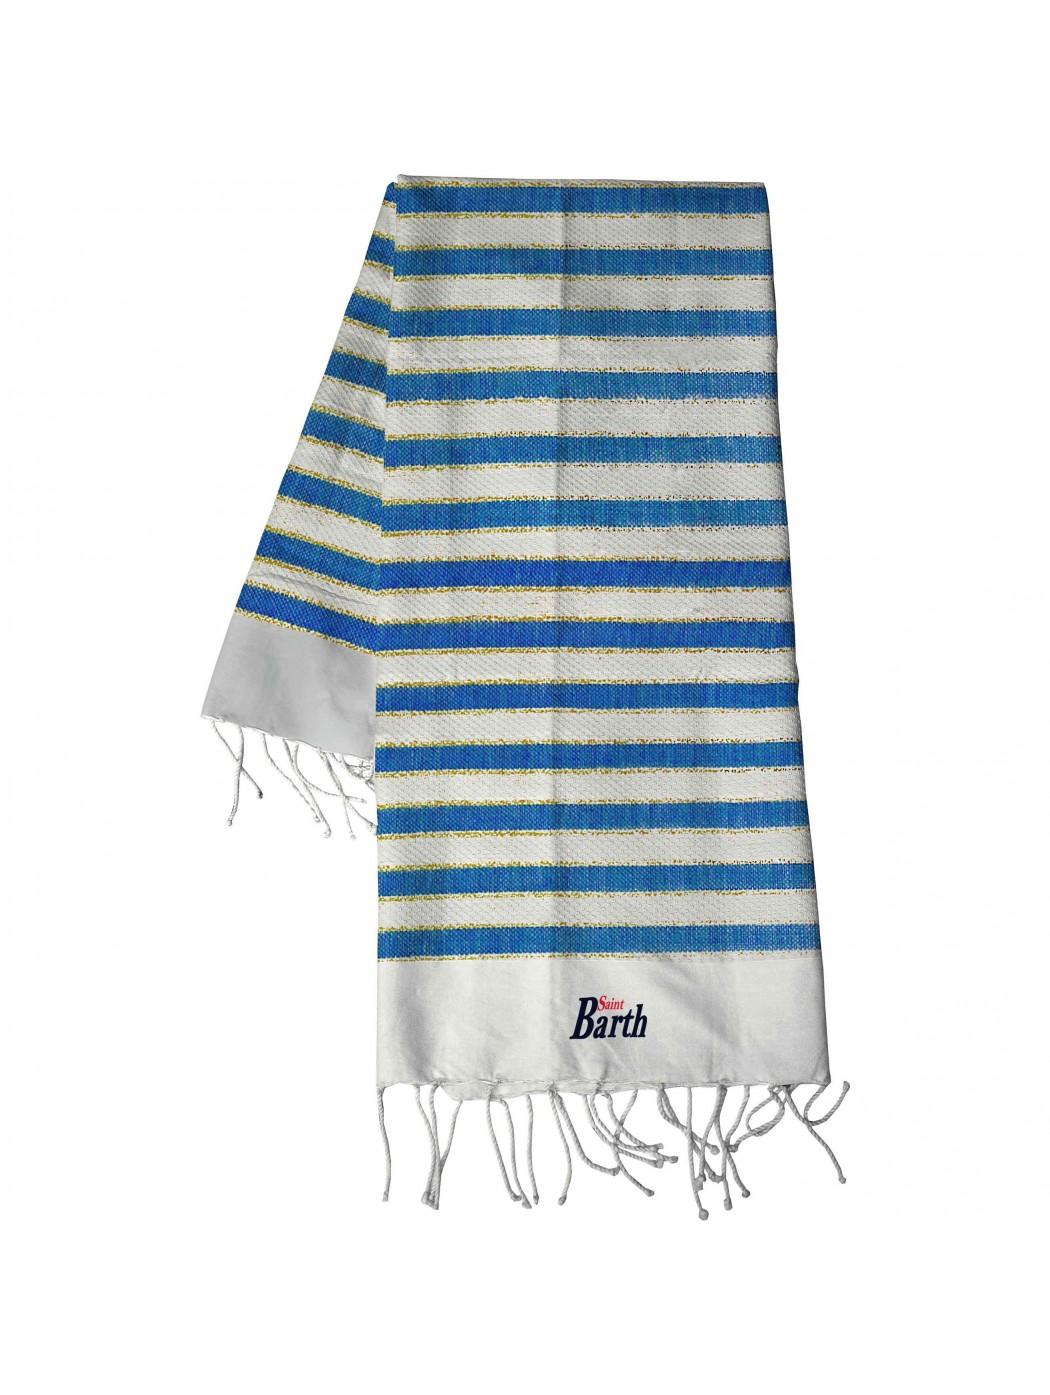 BEACH TOWEL FINGES FOUTAS SAINTBARTH MC2 FOUT001LIG 17O